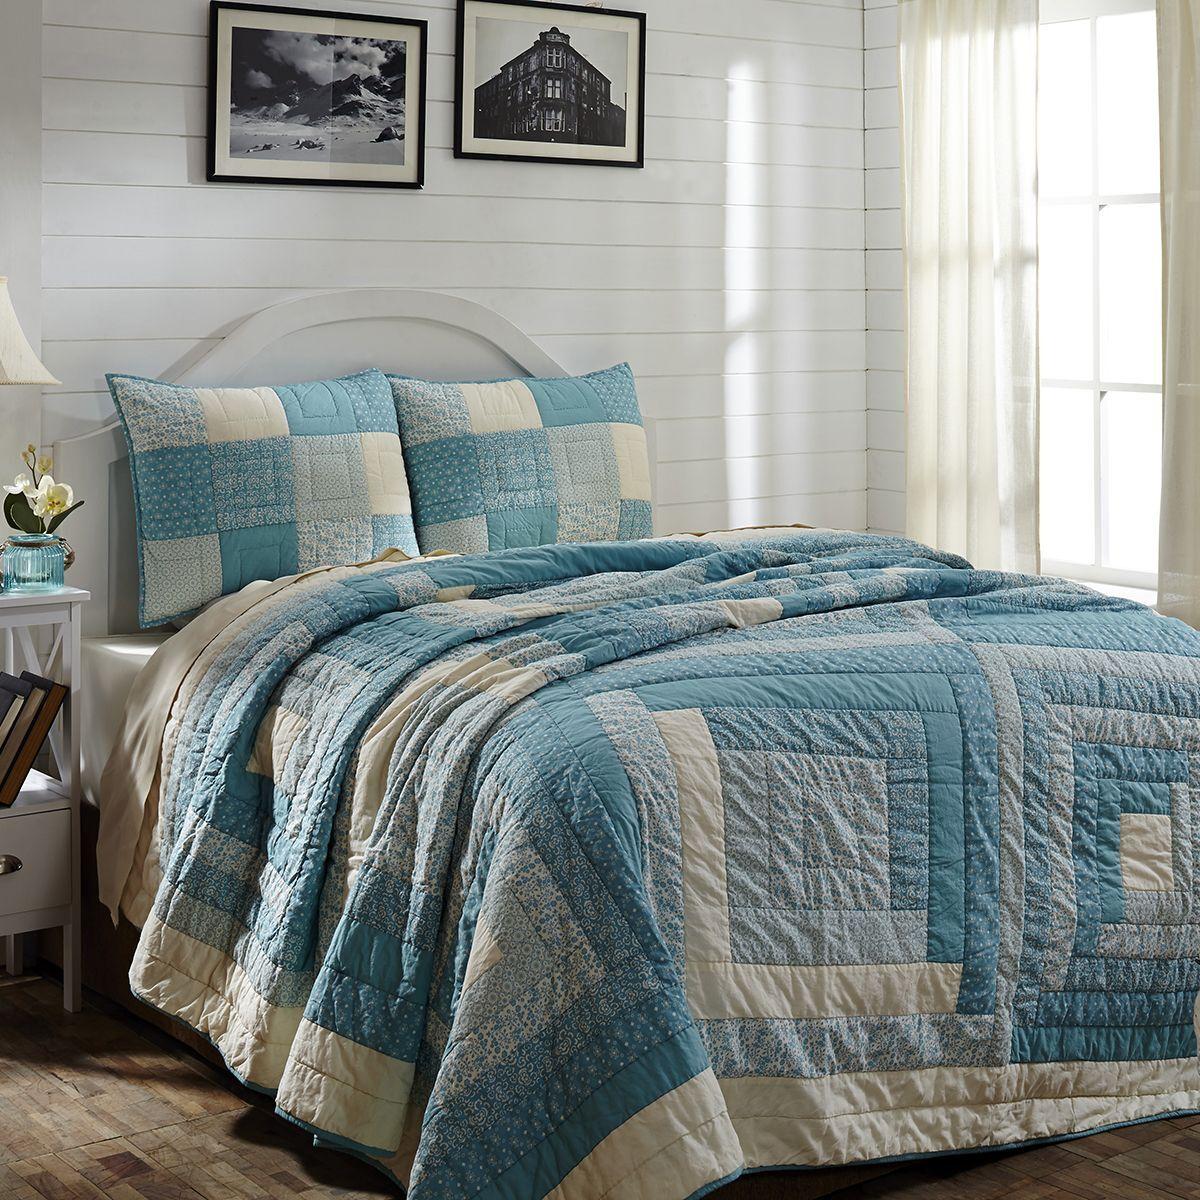 SEA COTTAGE blueeE CREAM 4 PC QUEEN QUILT BEDDING SET W  SHAMS BEDSKIRT LOG CABIN